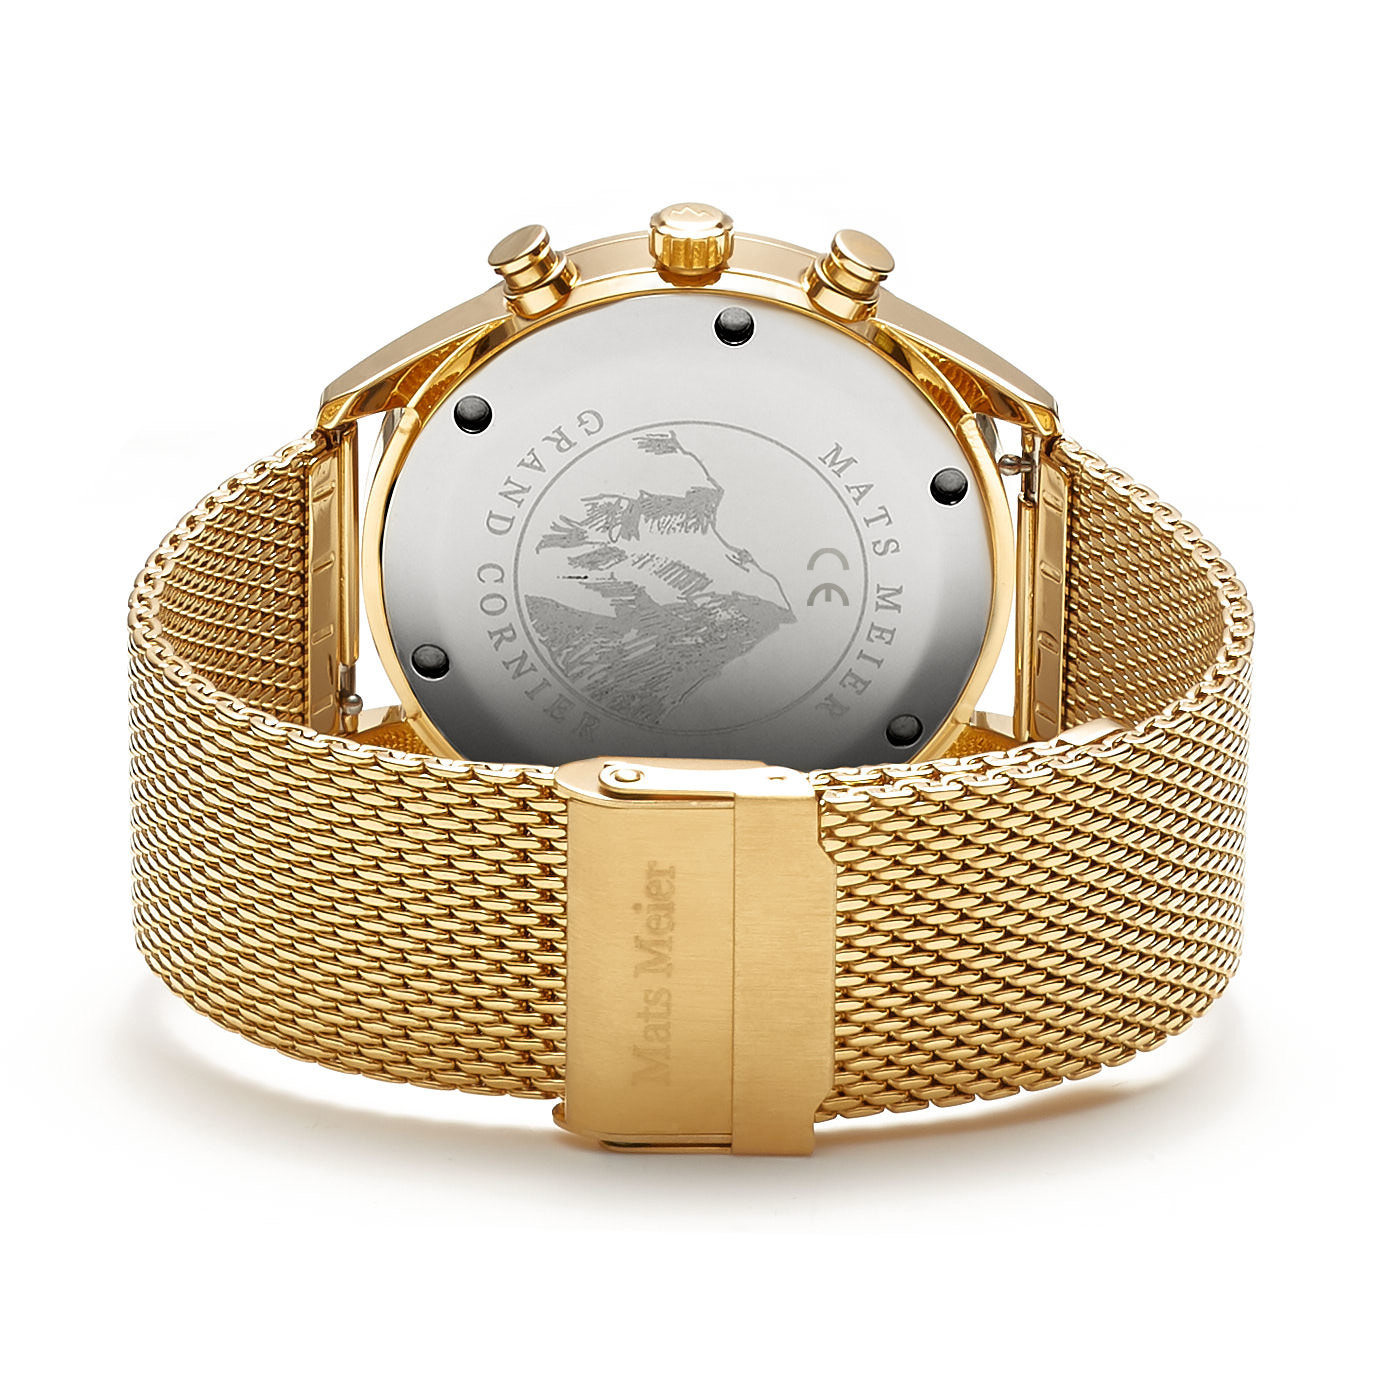 Mats Meier Grand Cornier chronograph mens watch green / gold colored mesh